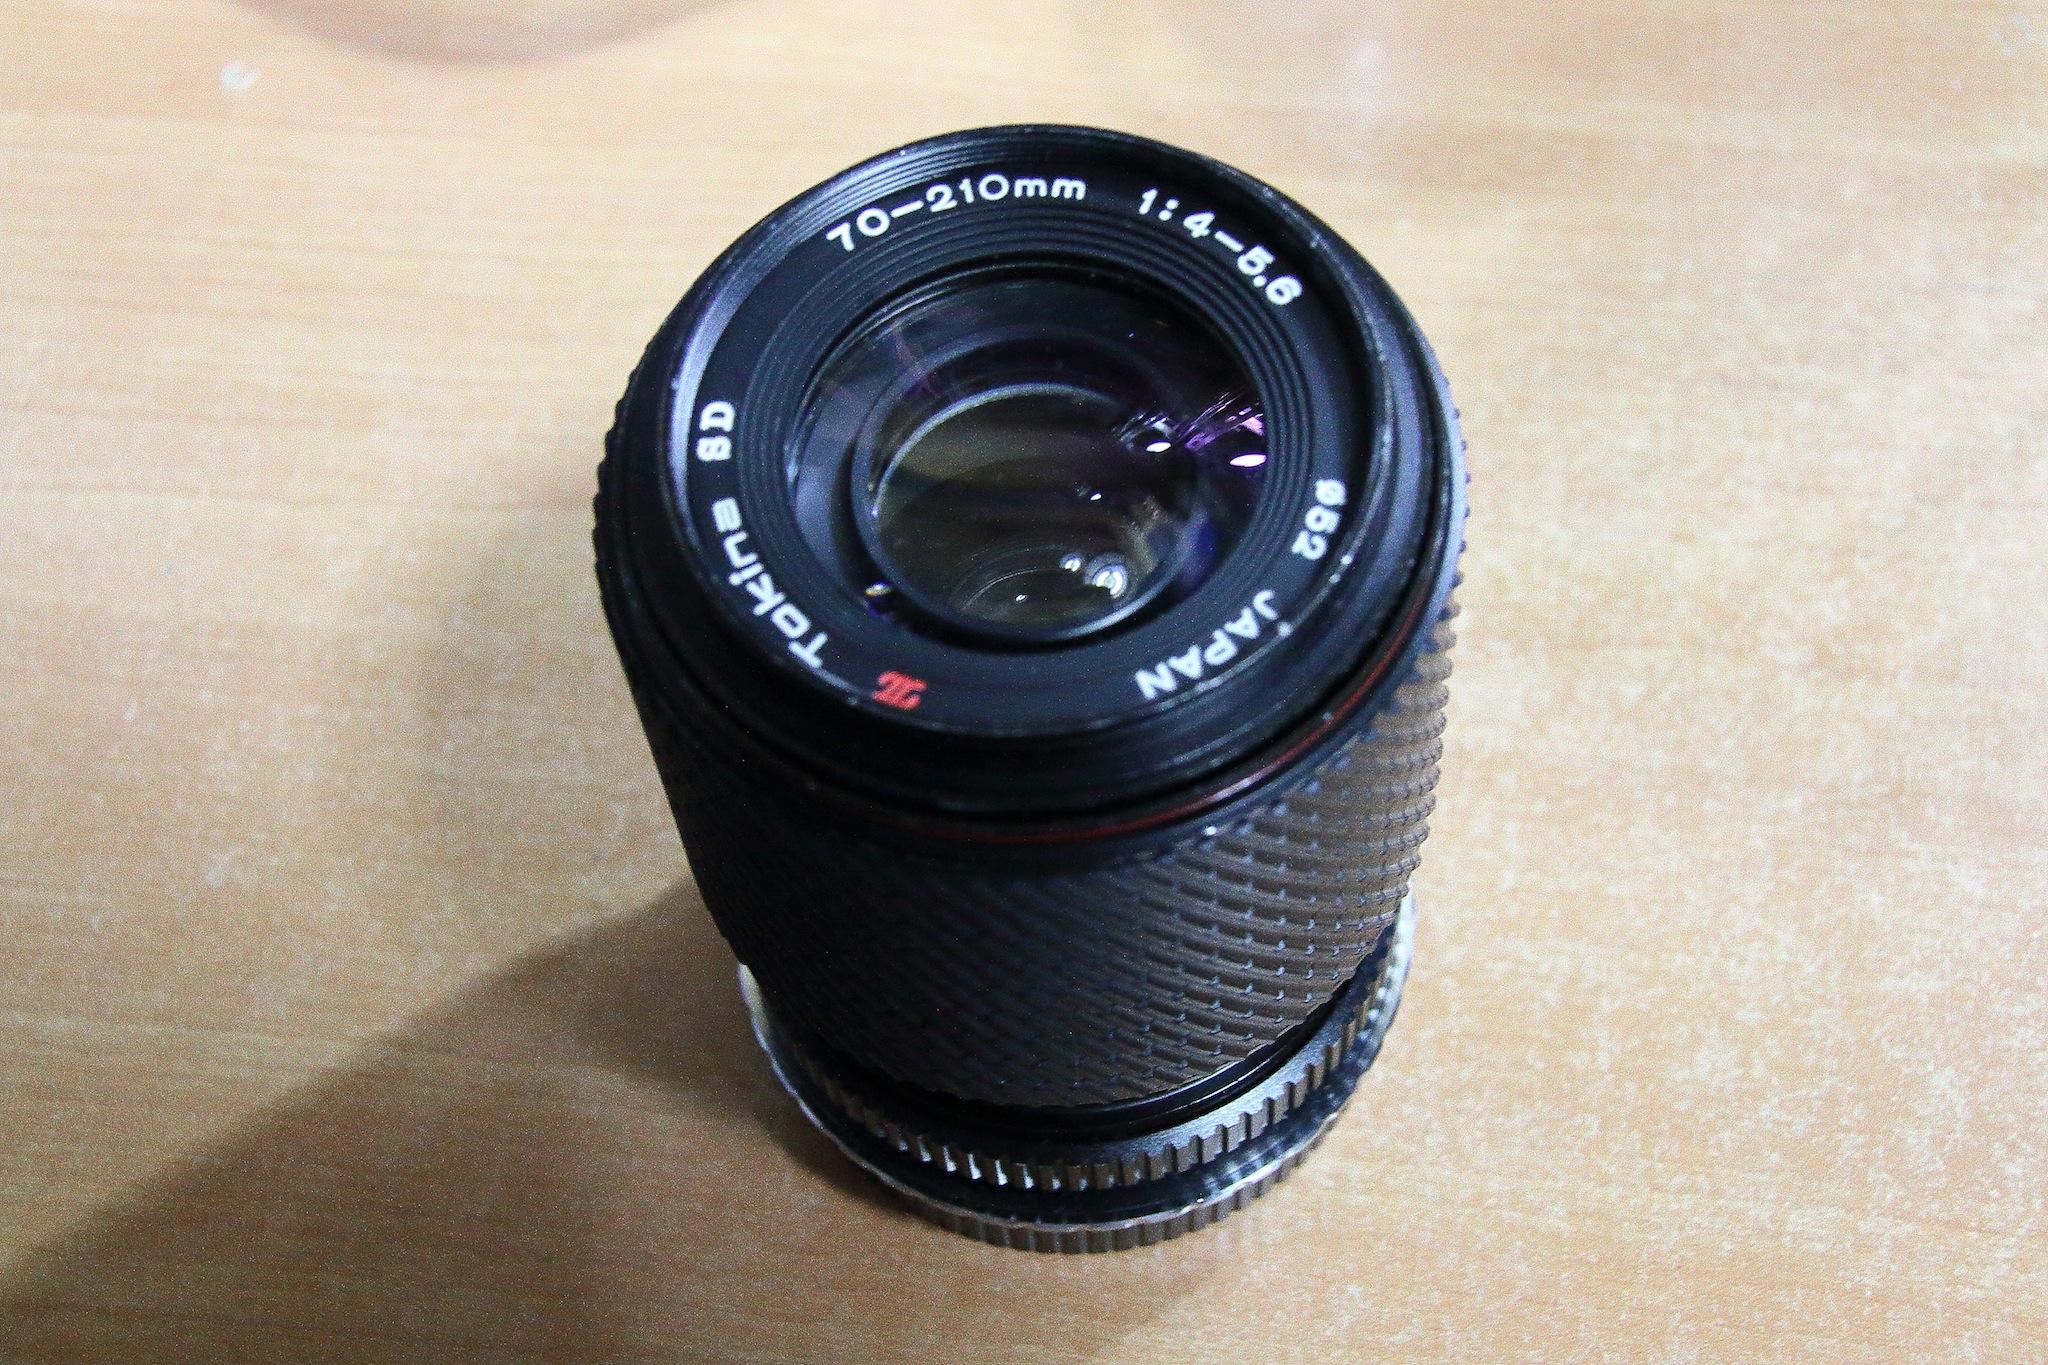 Tokina SD 70-210mm F4.0-5.6